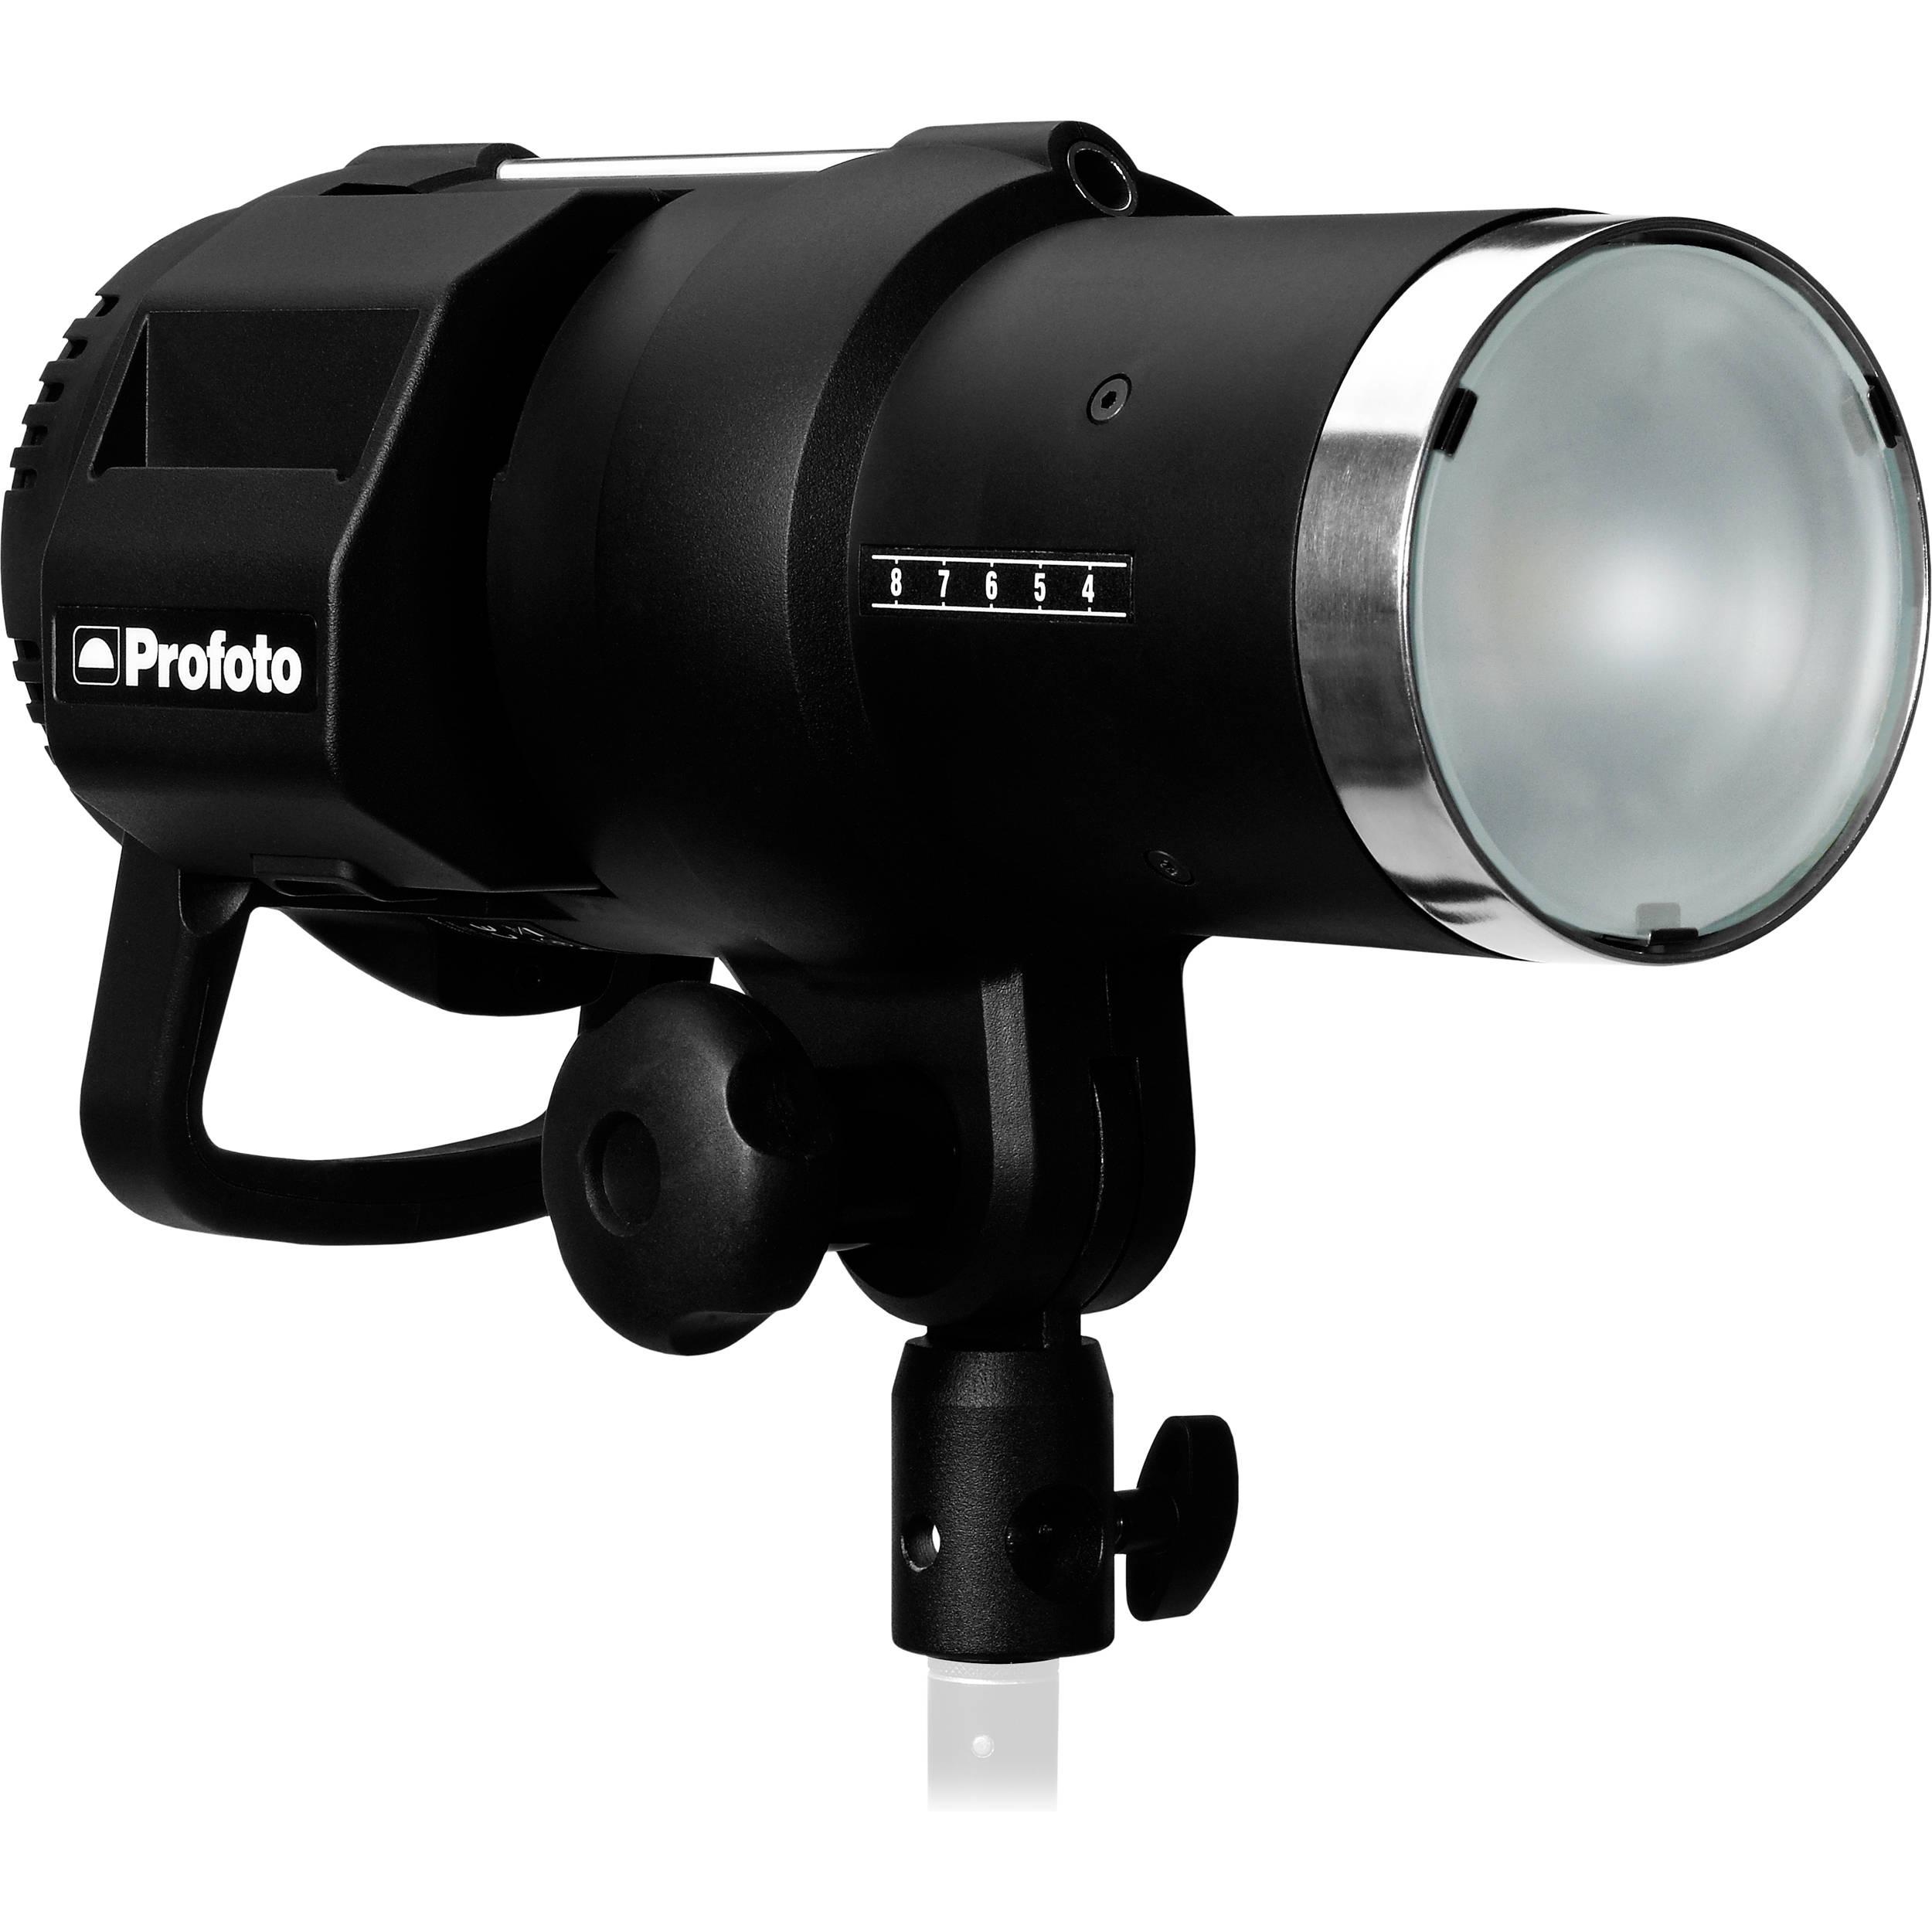 profoto 901094 b1 500 airttl monolight 1009783 image